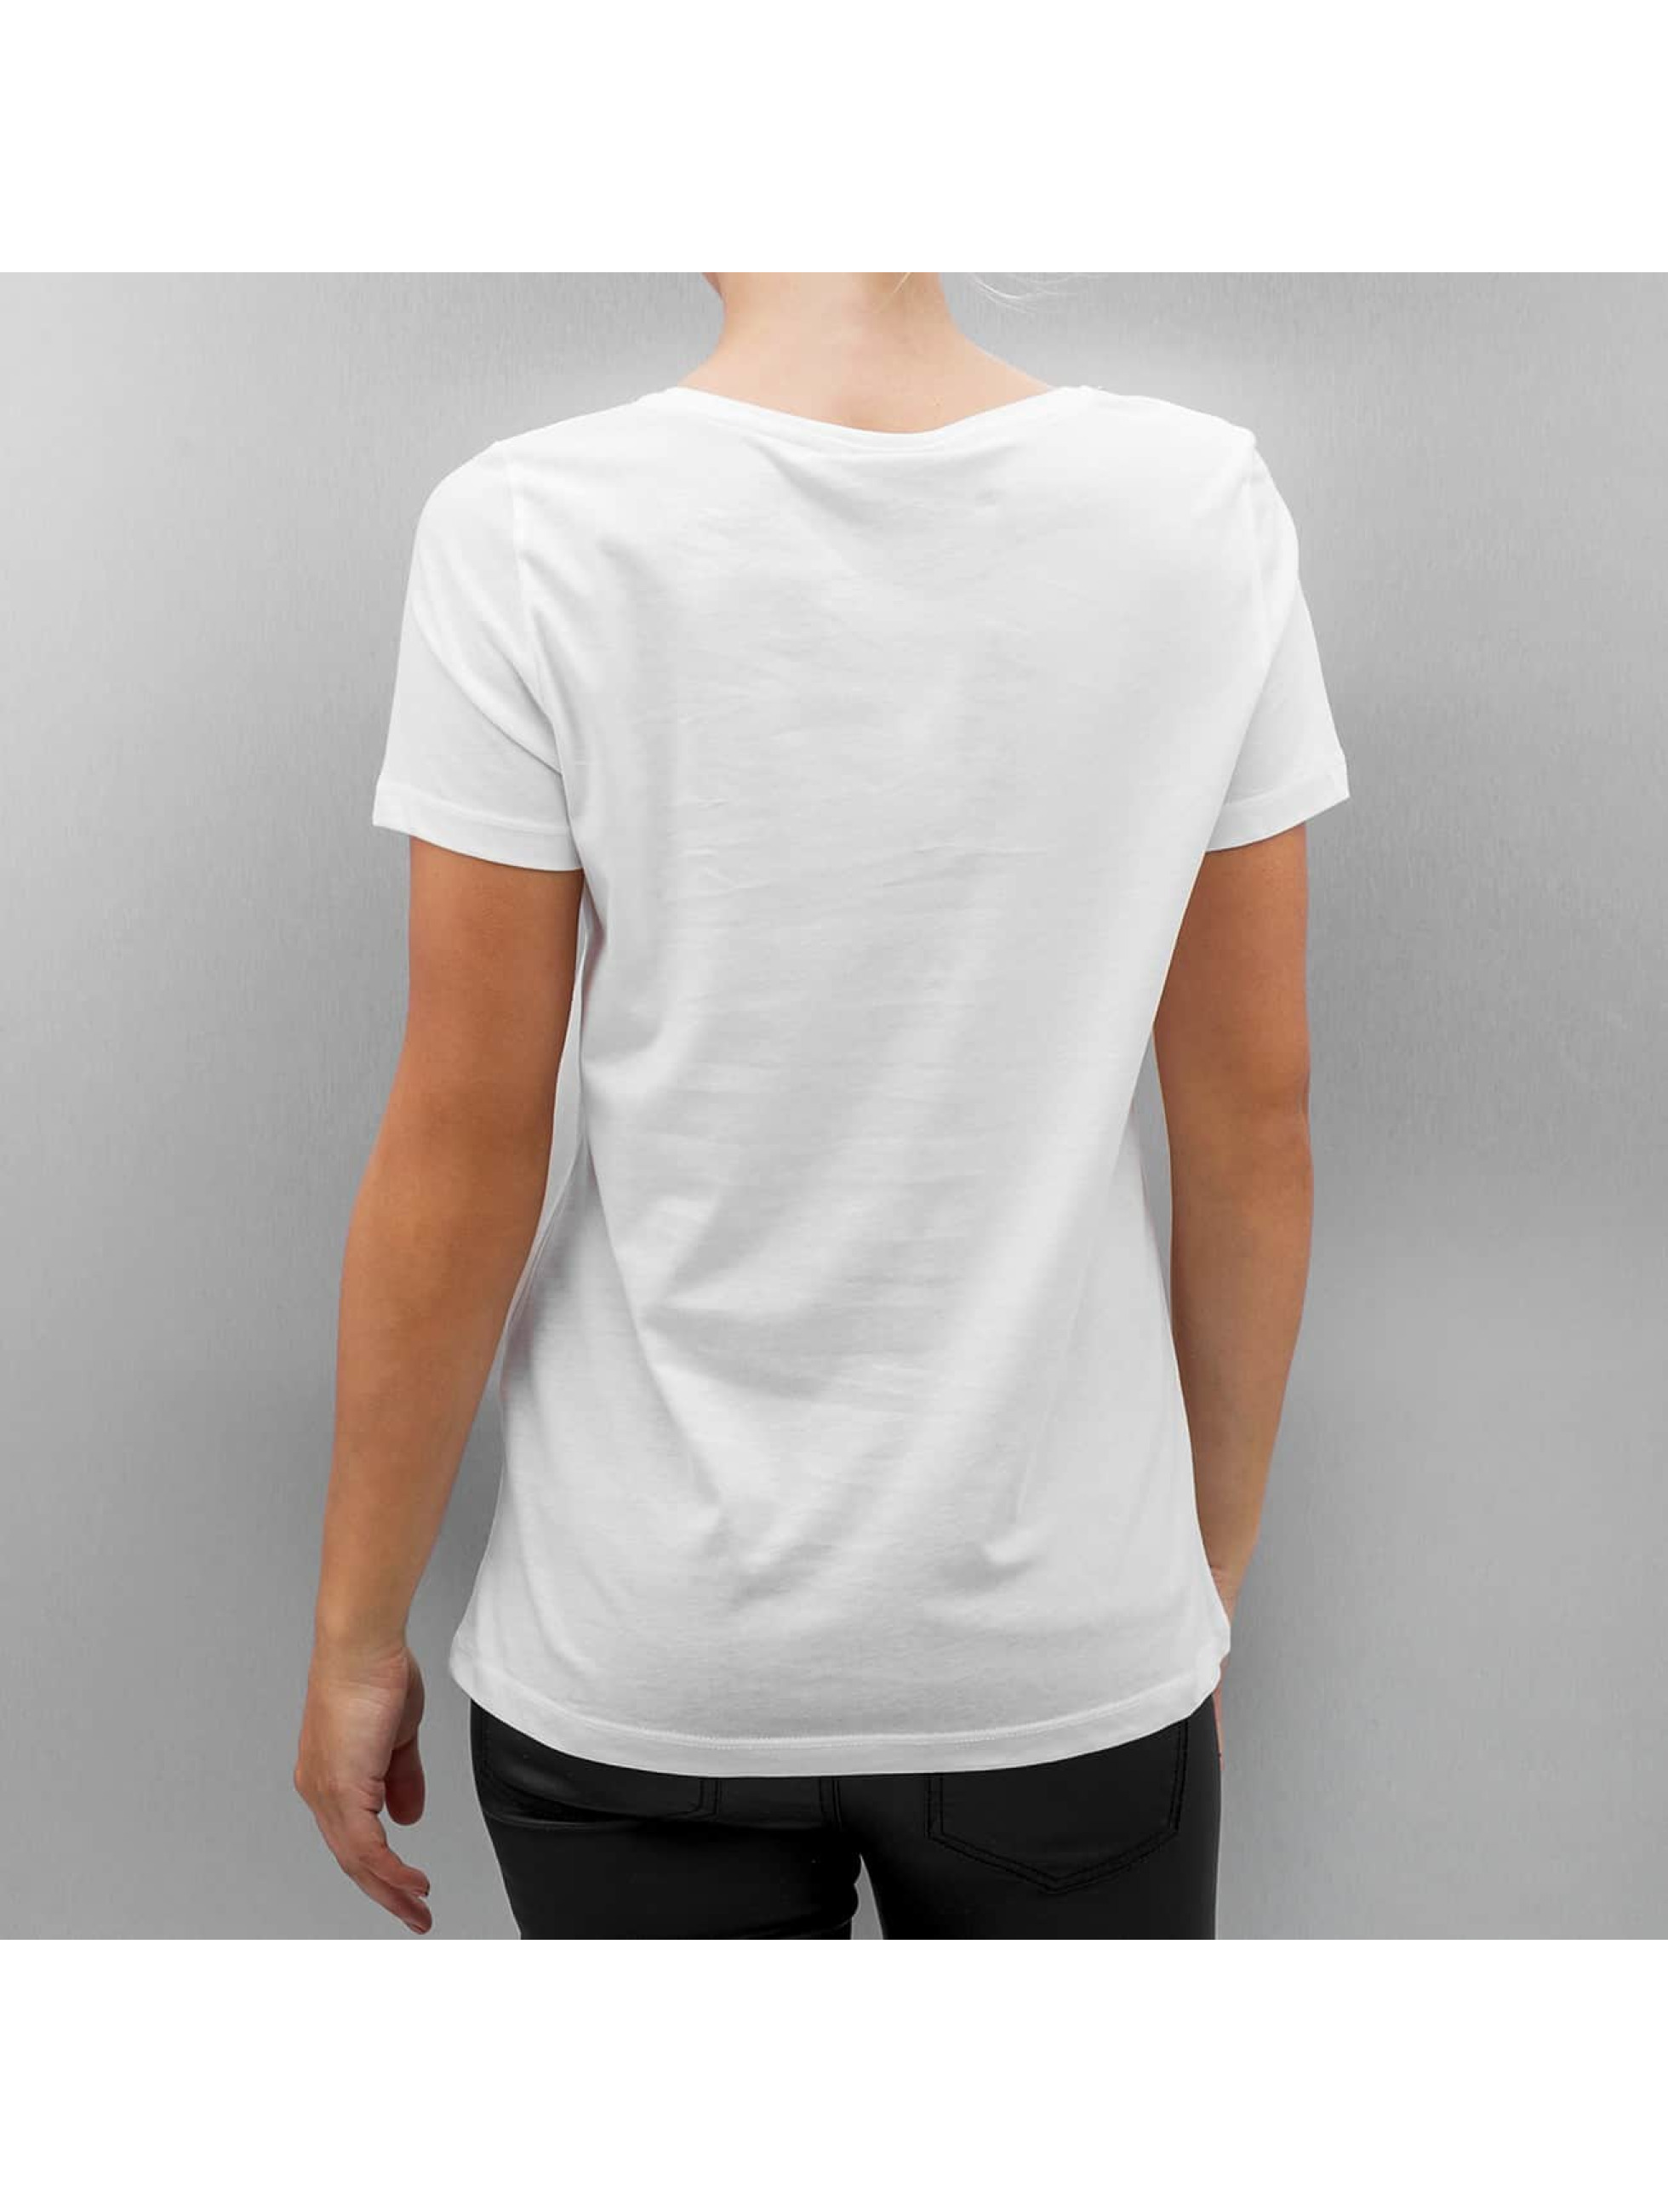 Vero Moda T-shirt VmMy vit